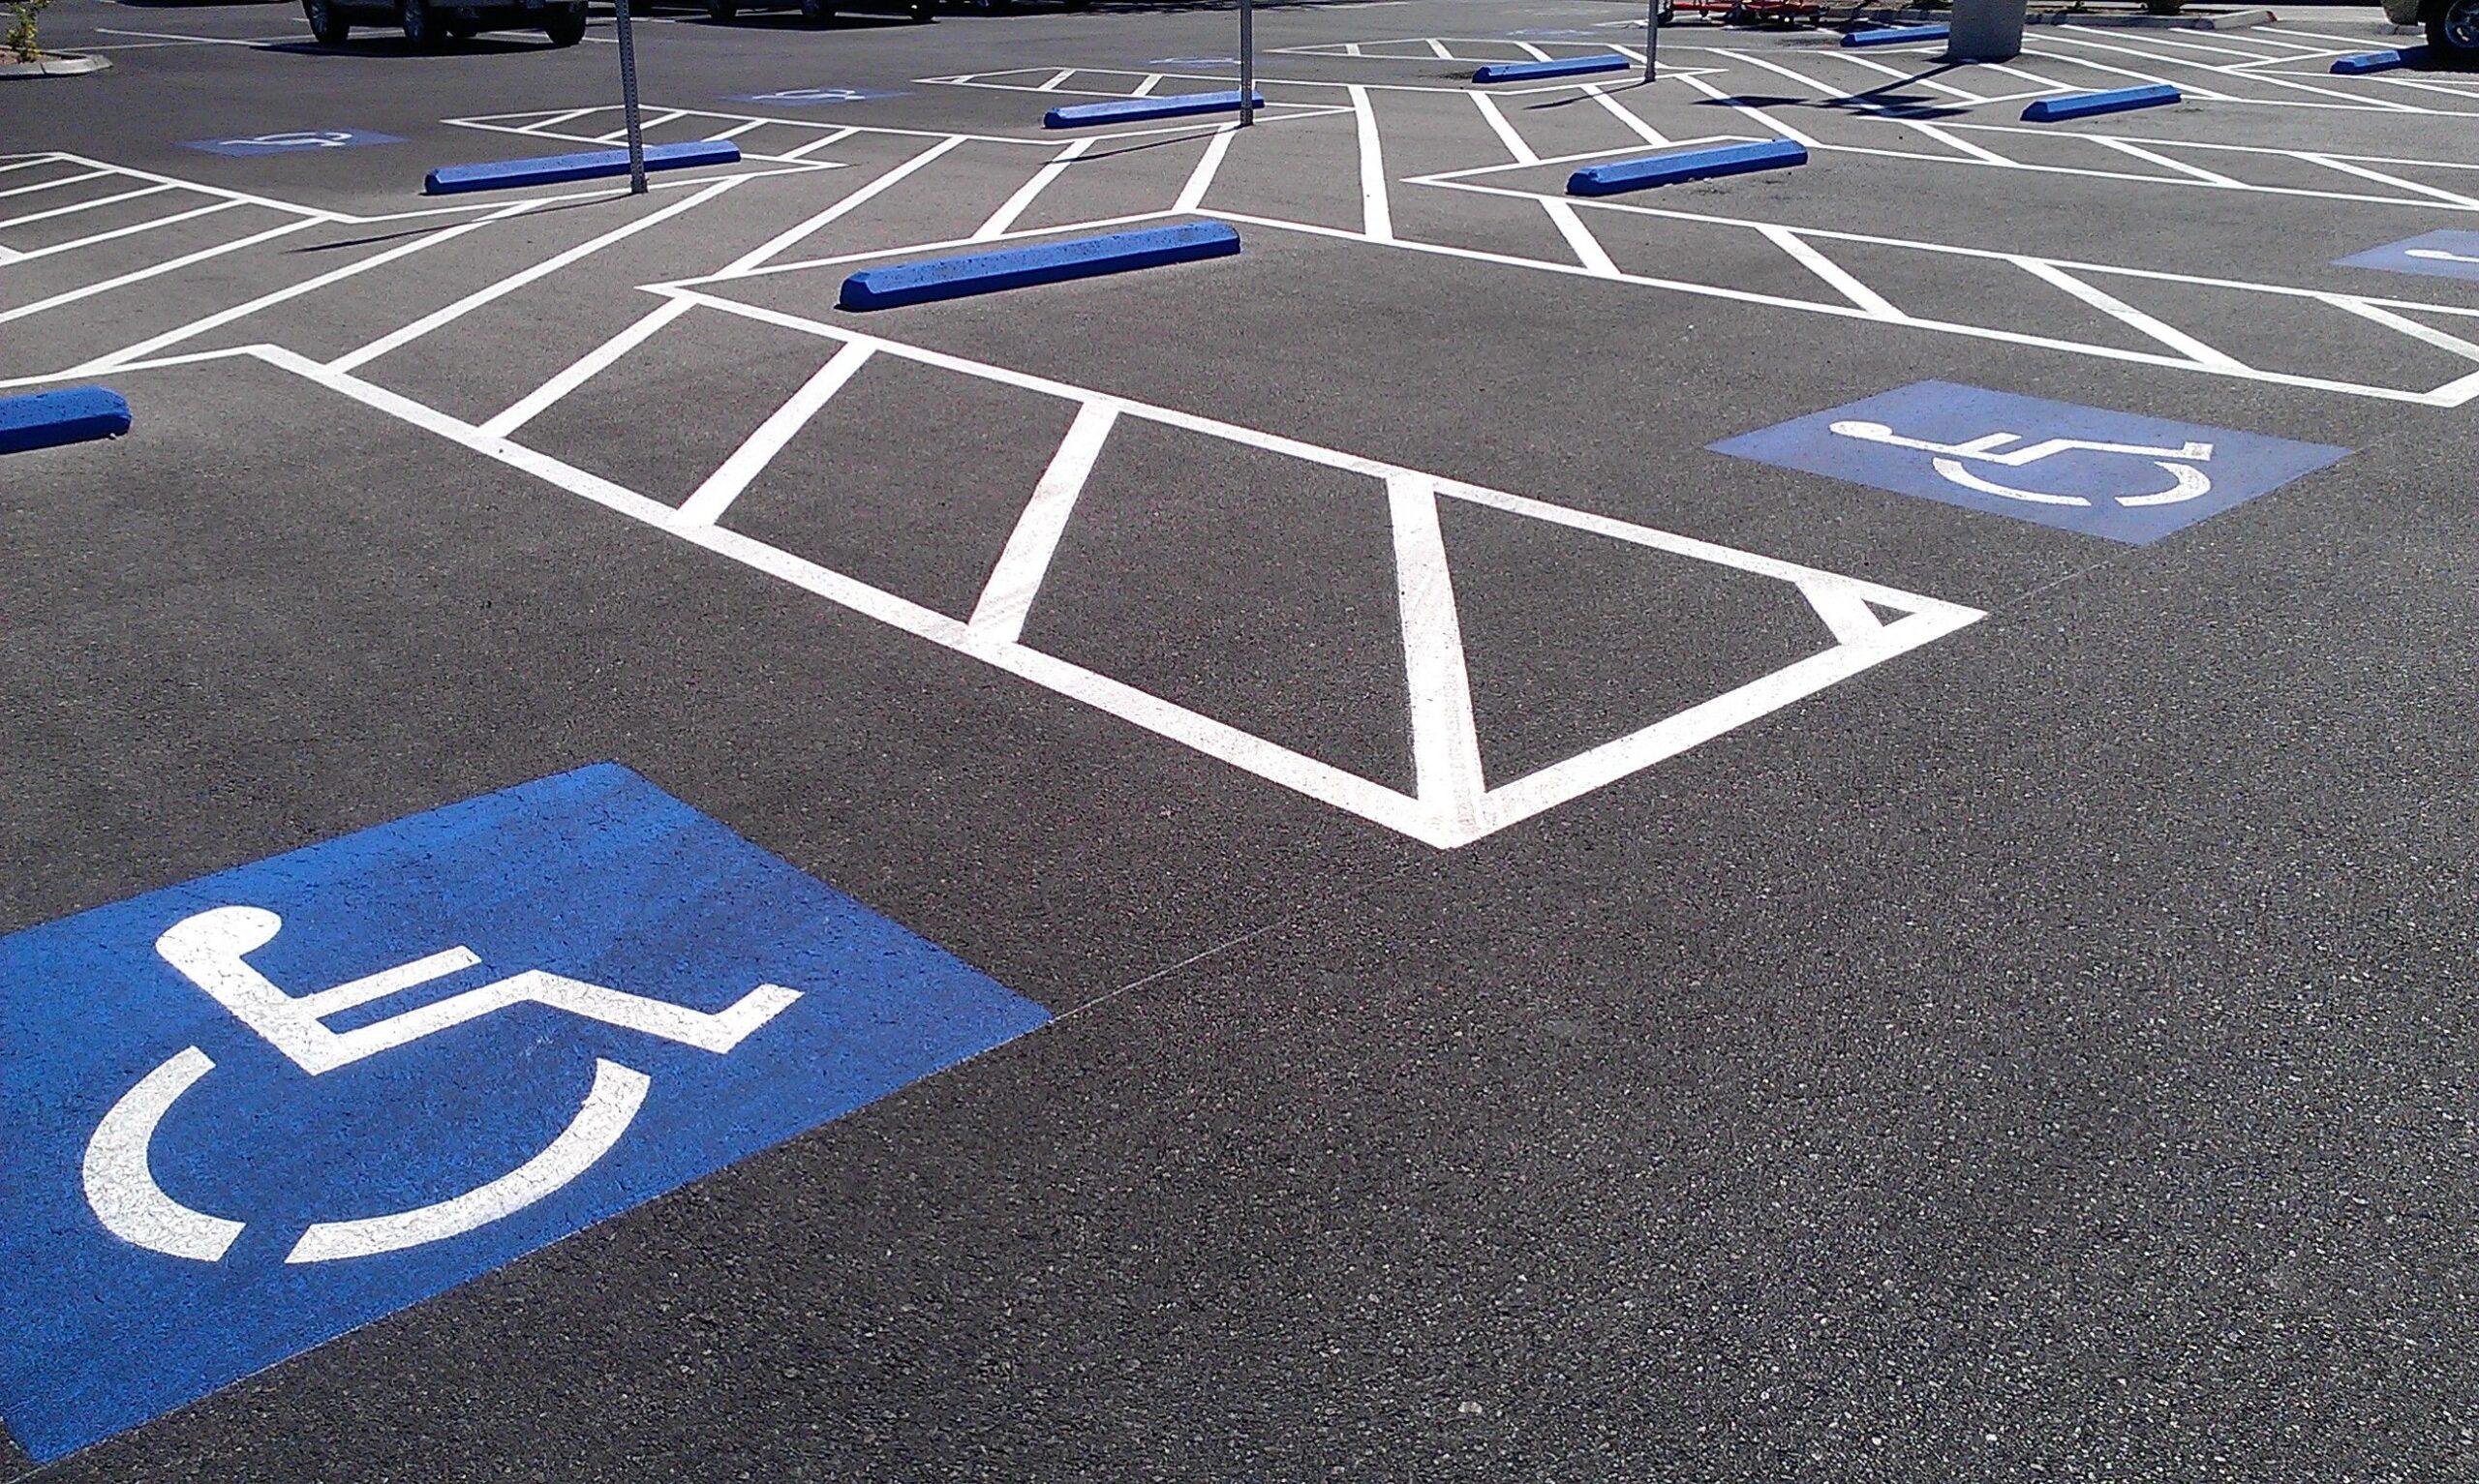 2. Parking lot striping